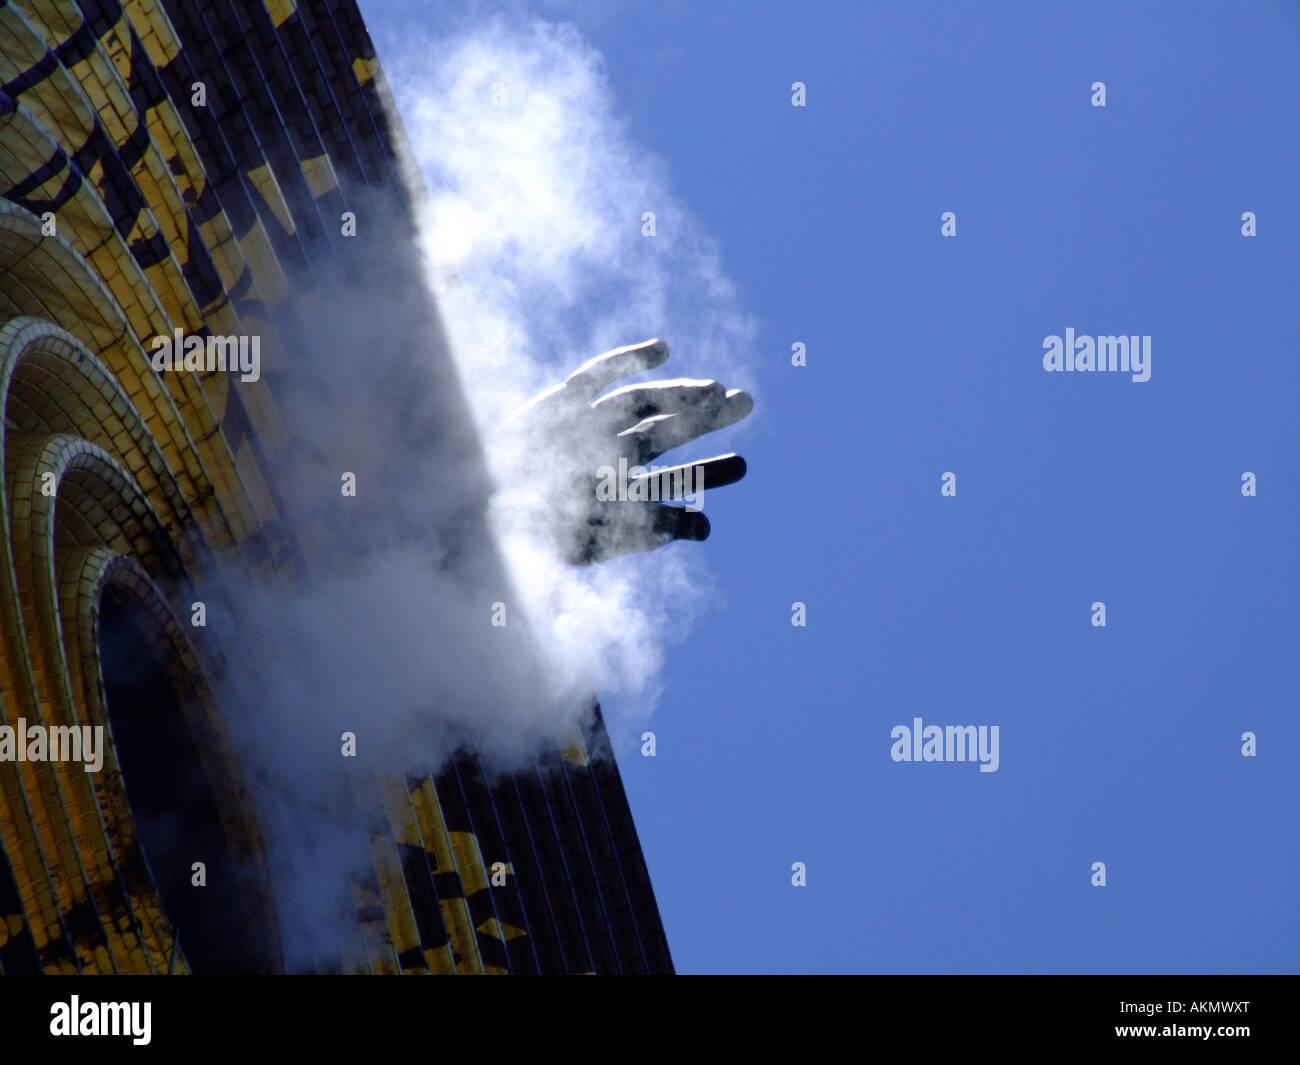 Metronome sculpture, Union Square, New York City - Stock Image